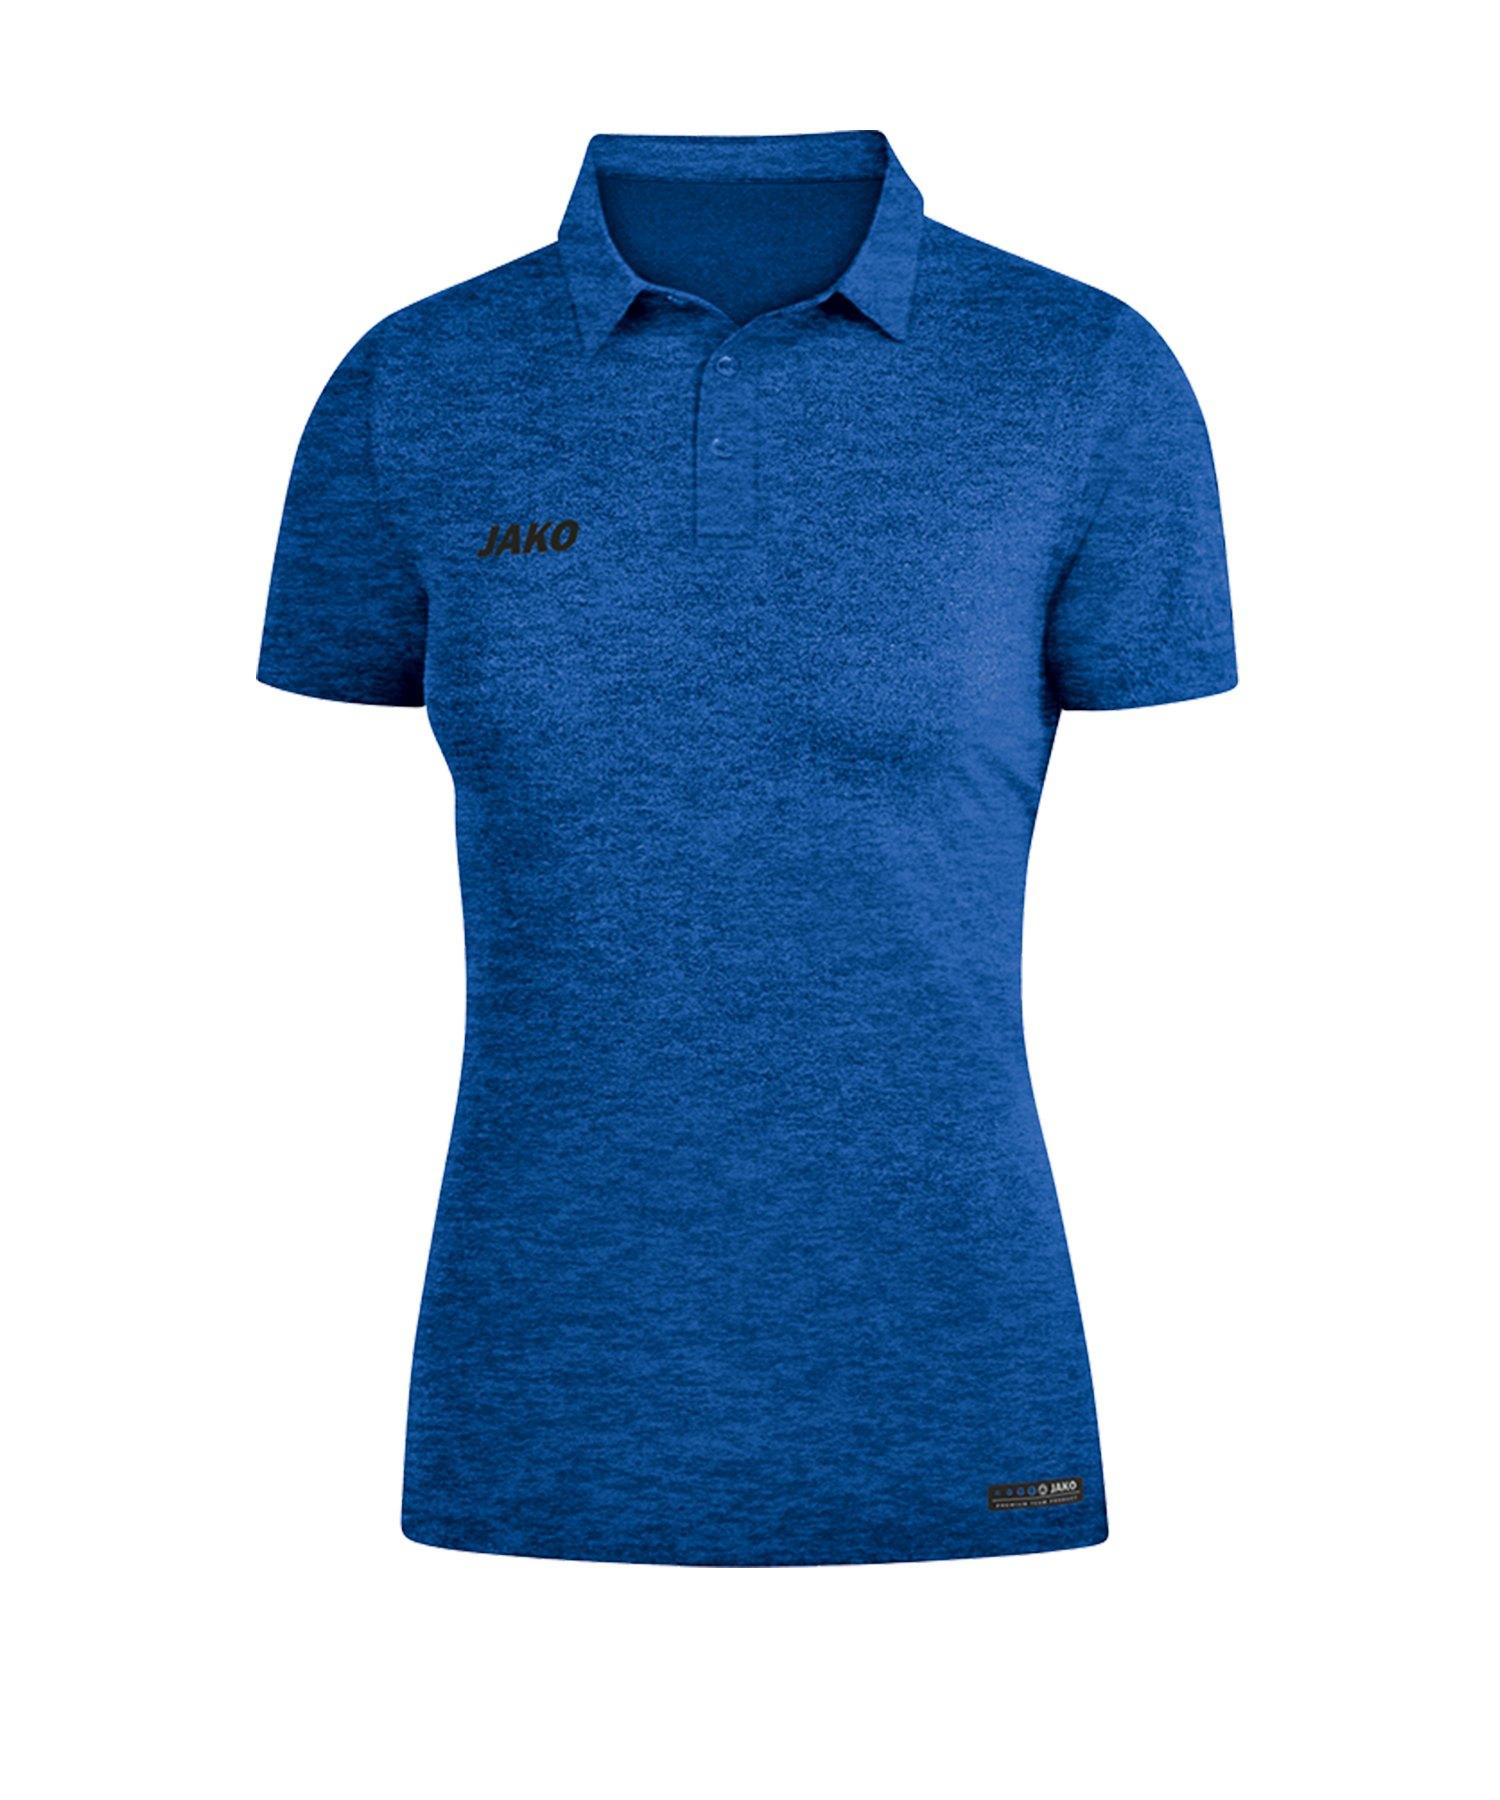 Jako Premium Basics Poloshirt Damen Blau F04 - Blau